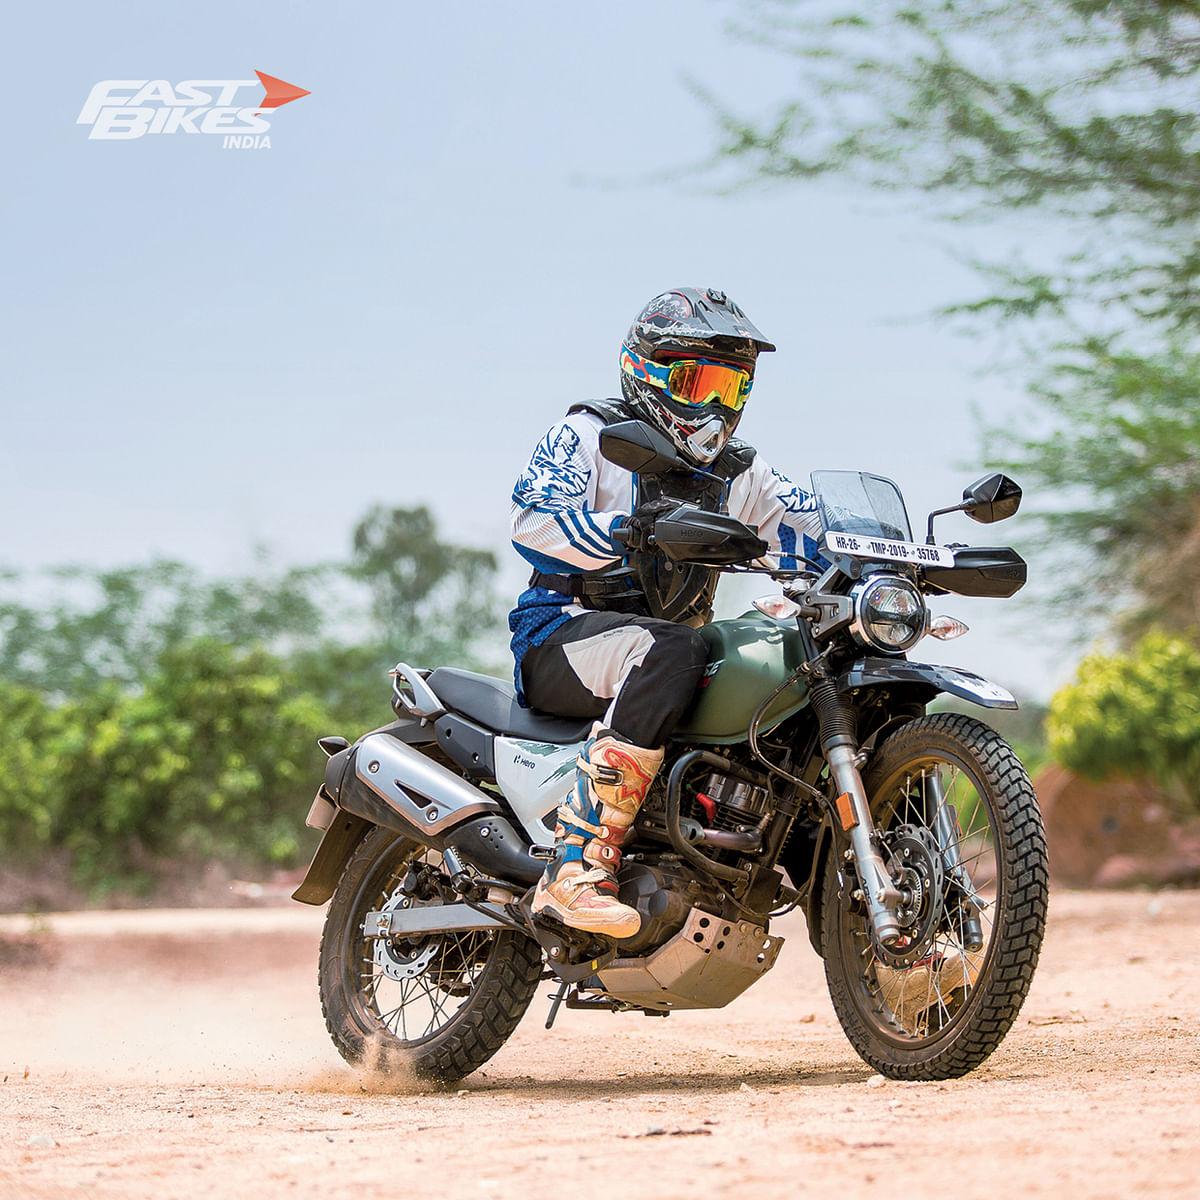 Bijoy Kumar column – The charm of on-off road bikes